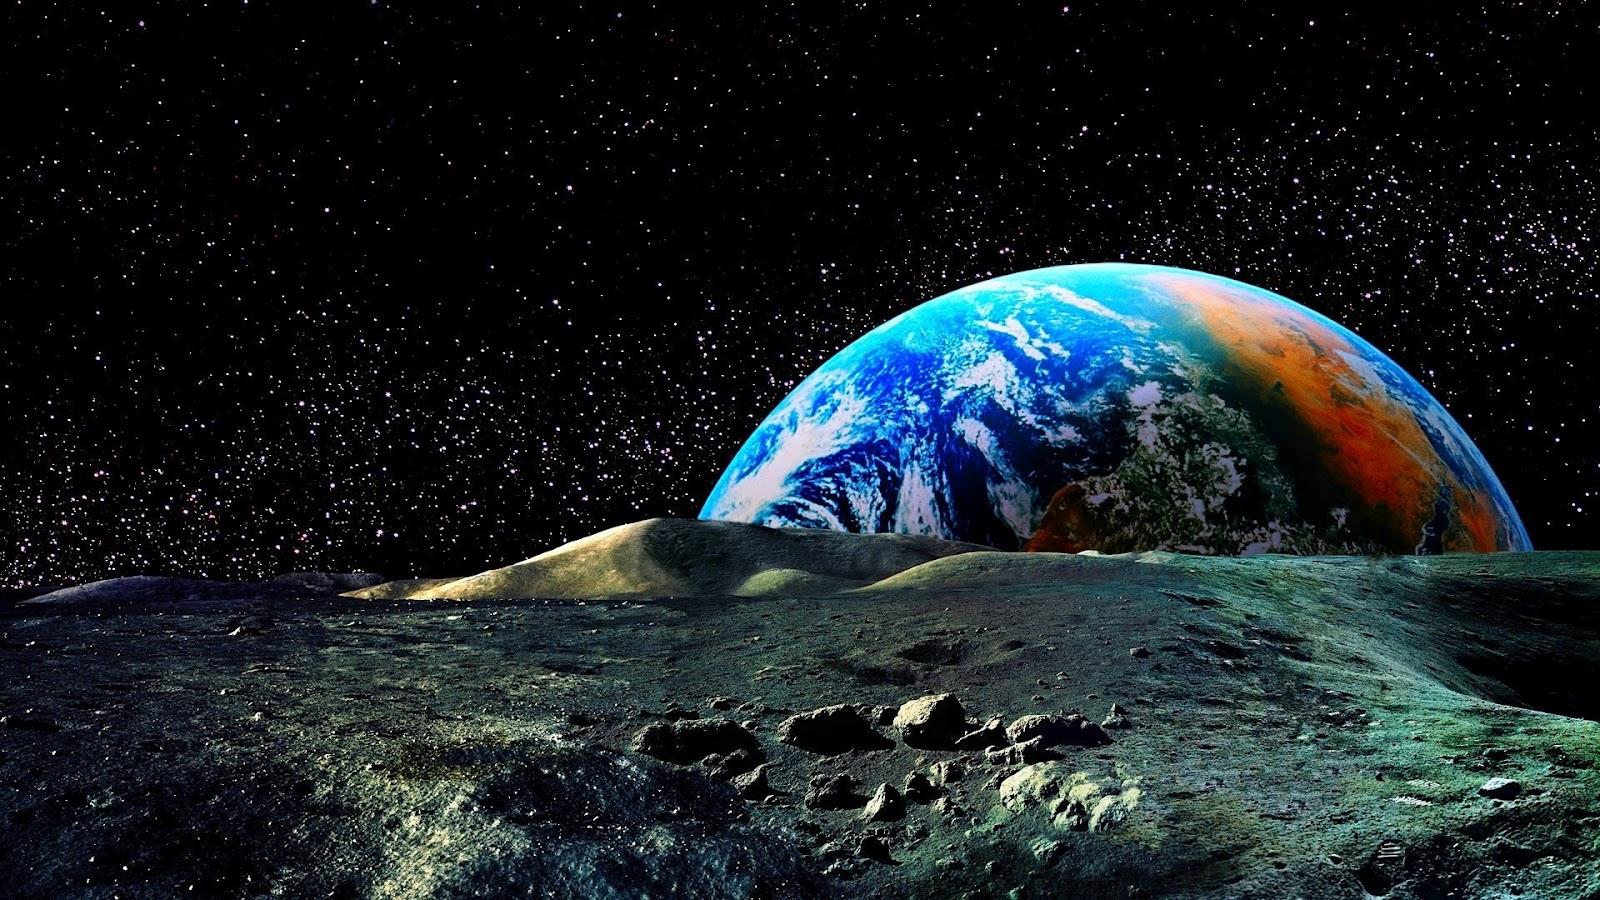 Sfondi Bellissimi Hd Luna E Terra Sfondi Hd Gratis